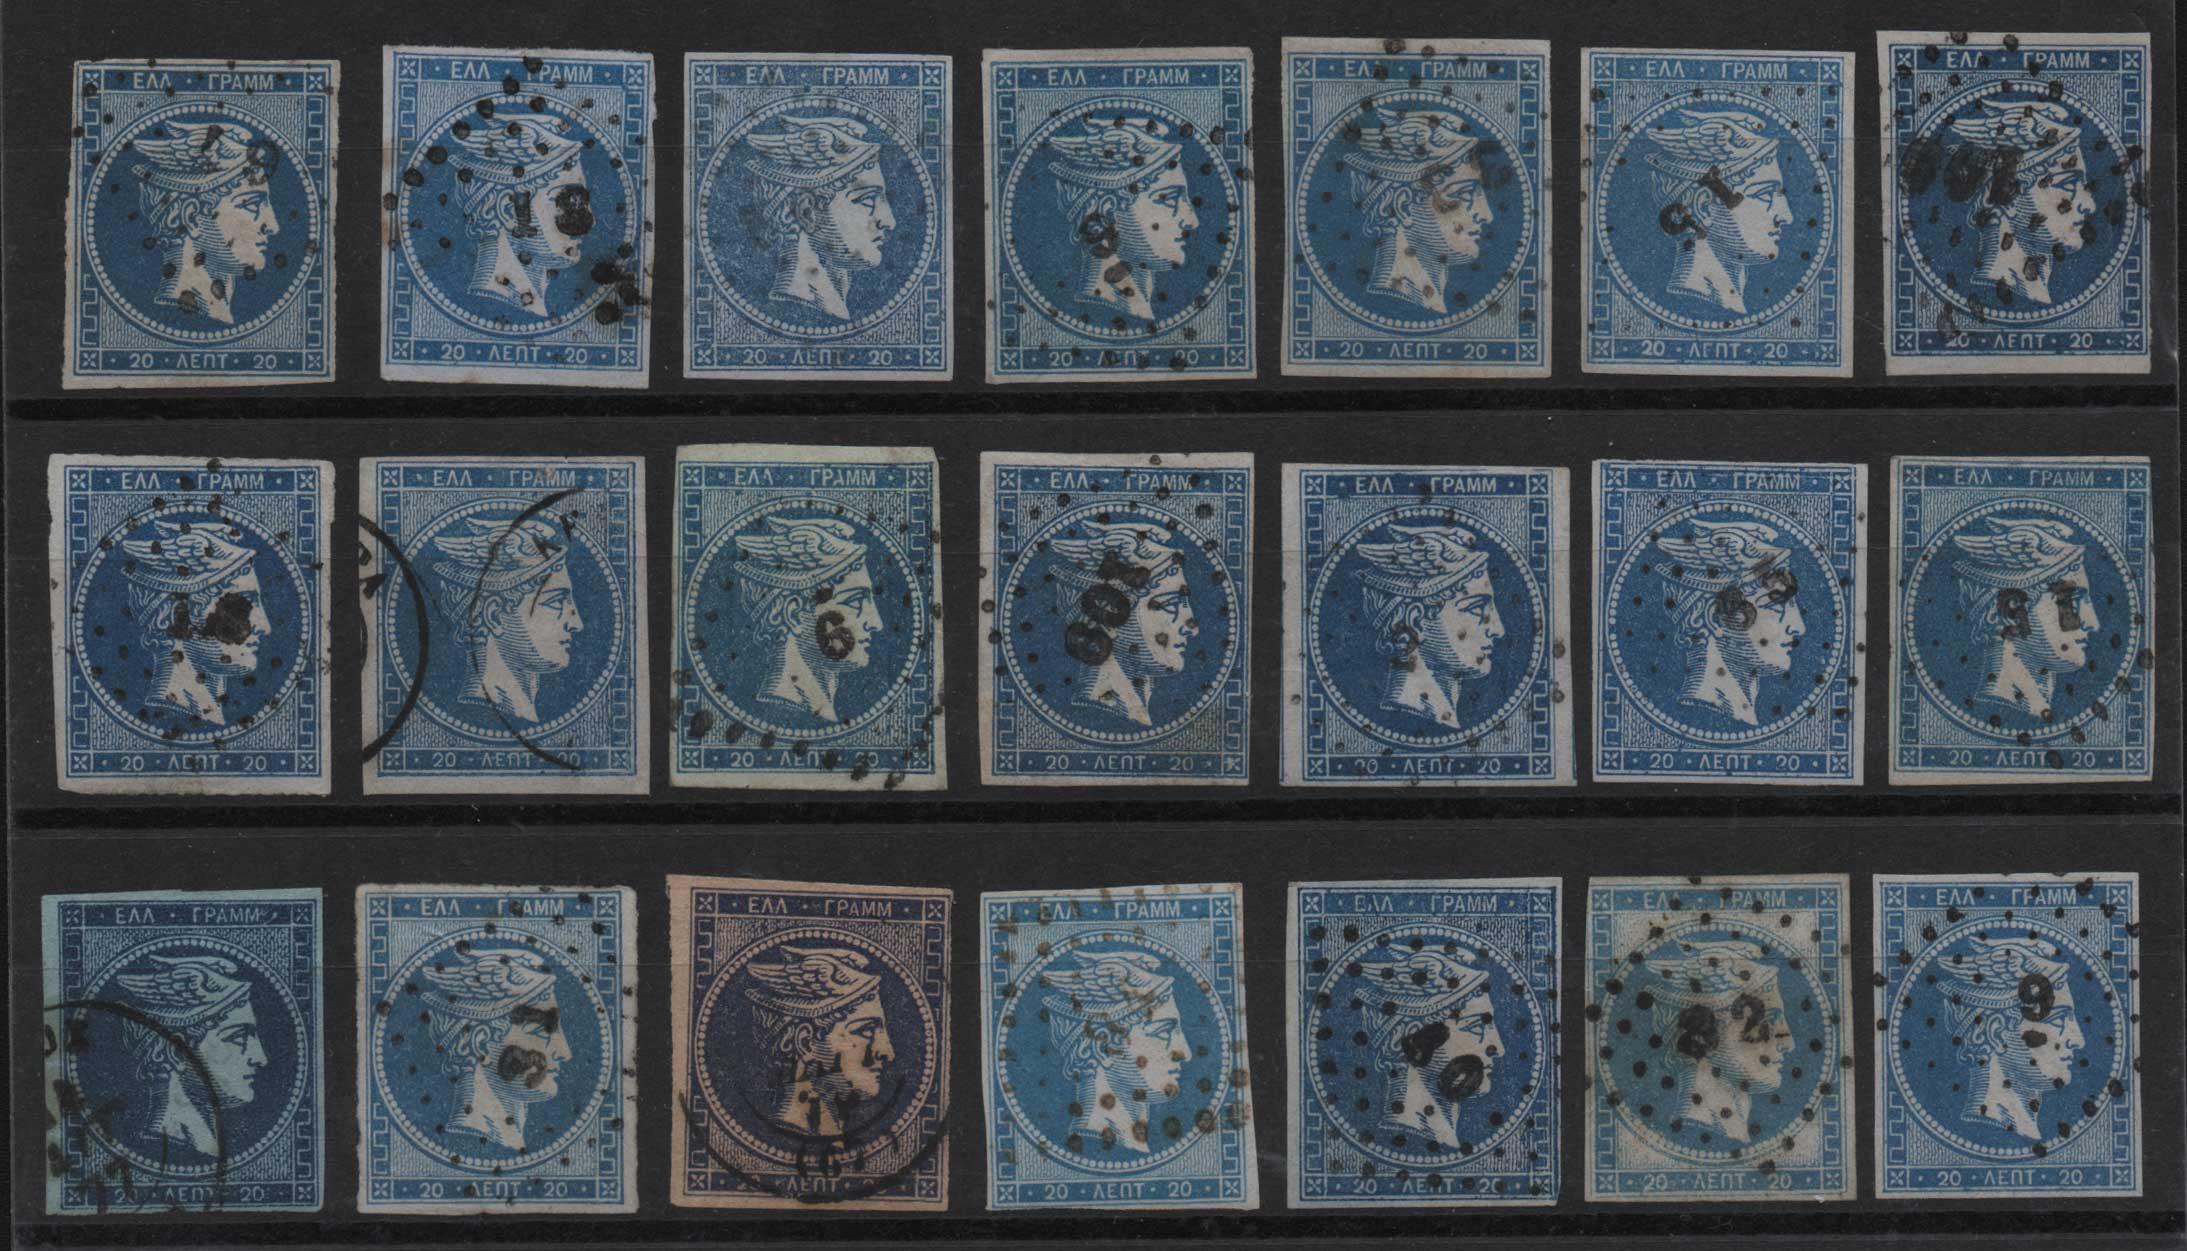 Lot 26 - -  LARGE HERMES HEAD large hermes head -  Athens Auctions Public Auction 74 General Stamp Sale